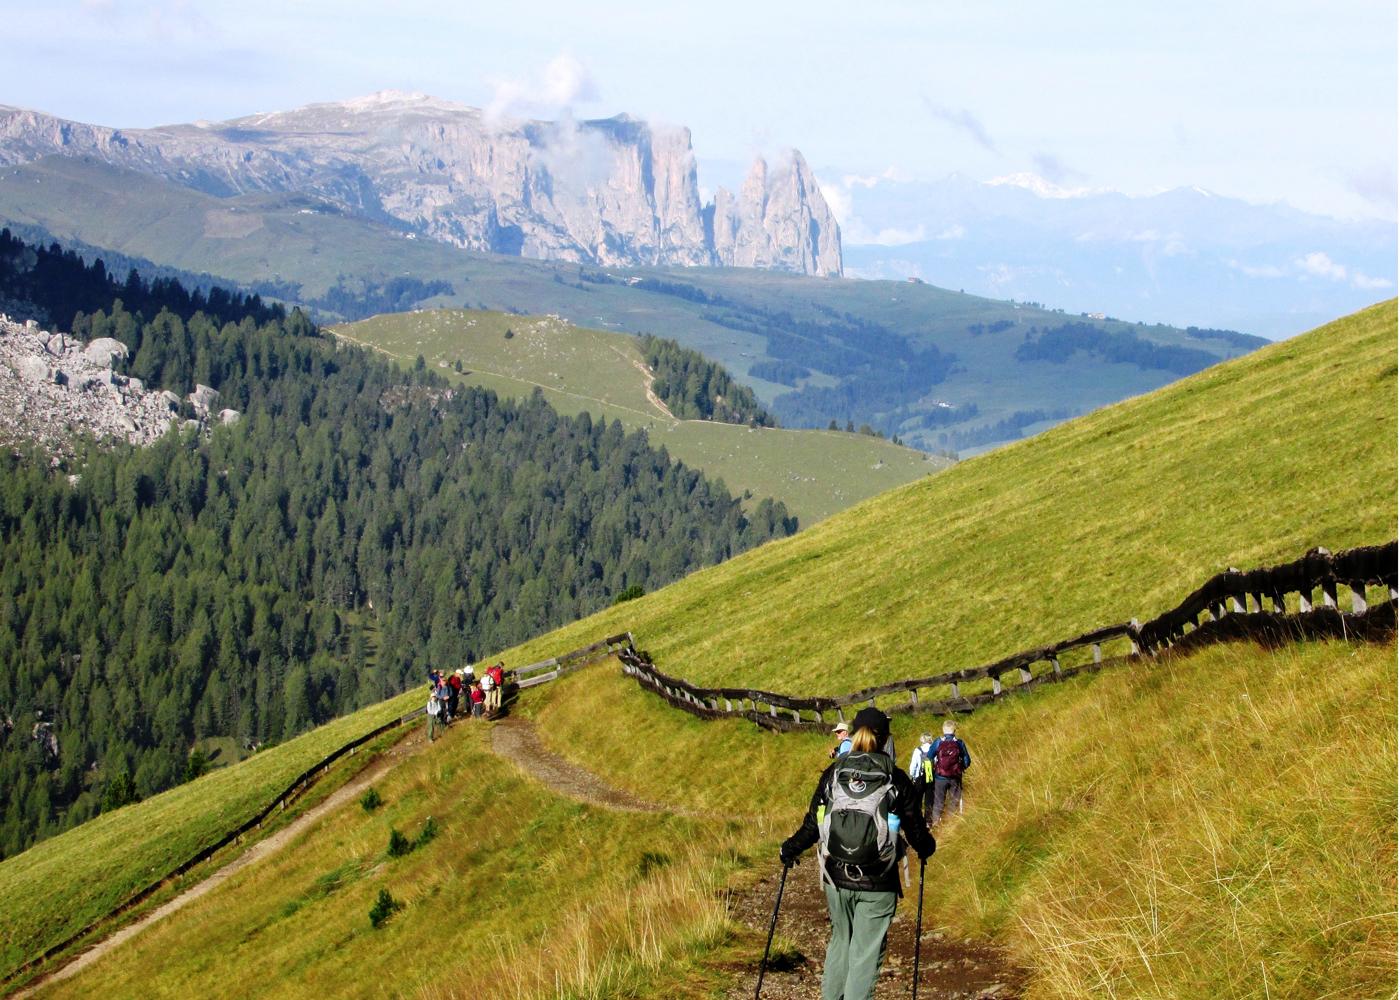 Dolomites Hiking Adventure Italy Sierra Club